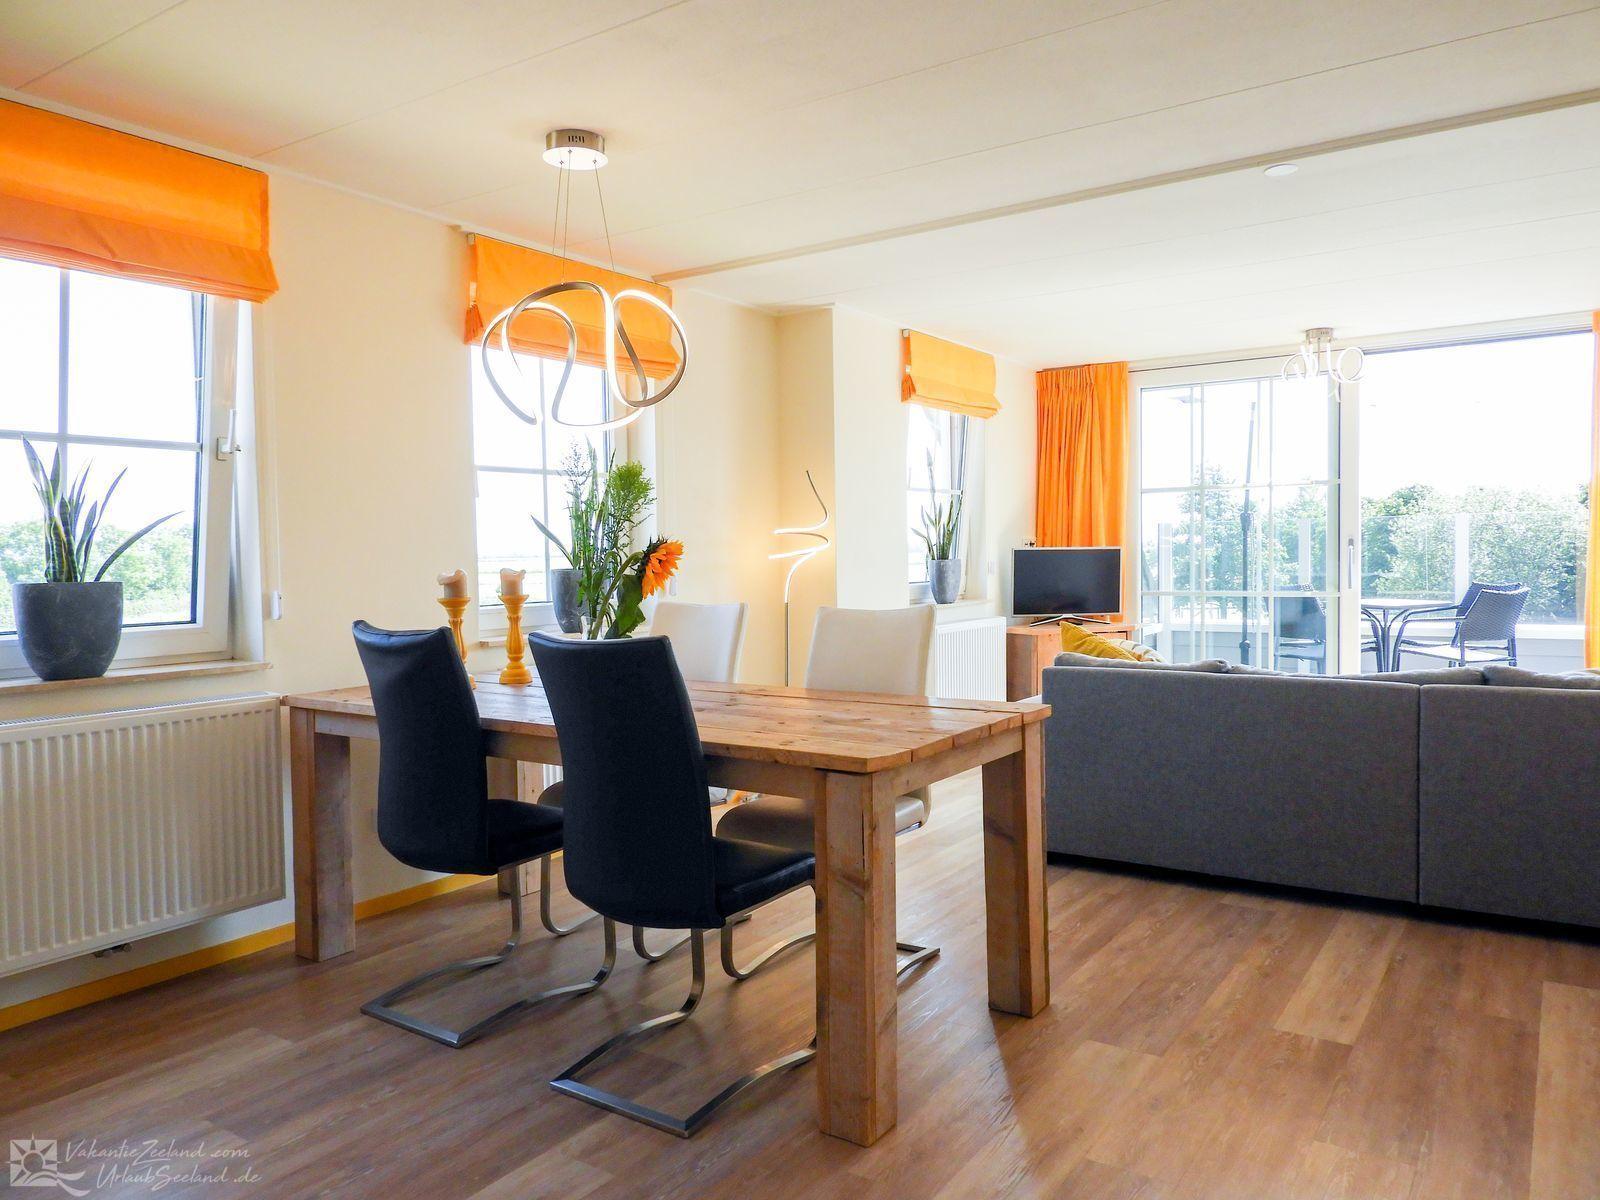 VZ722  Vakantieappartement Aagtekerke